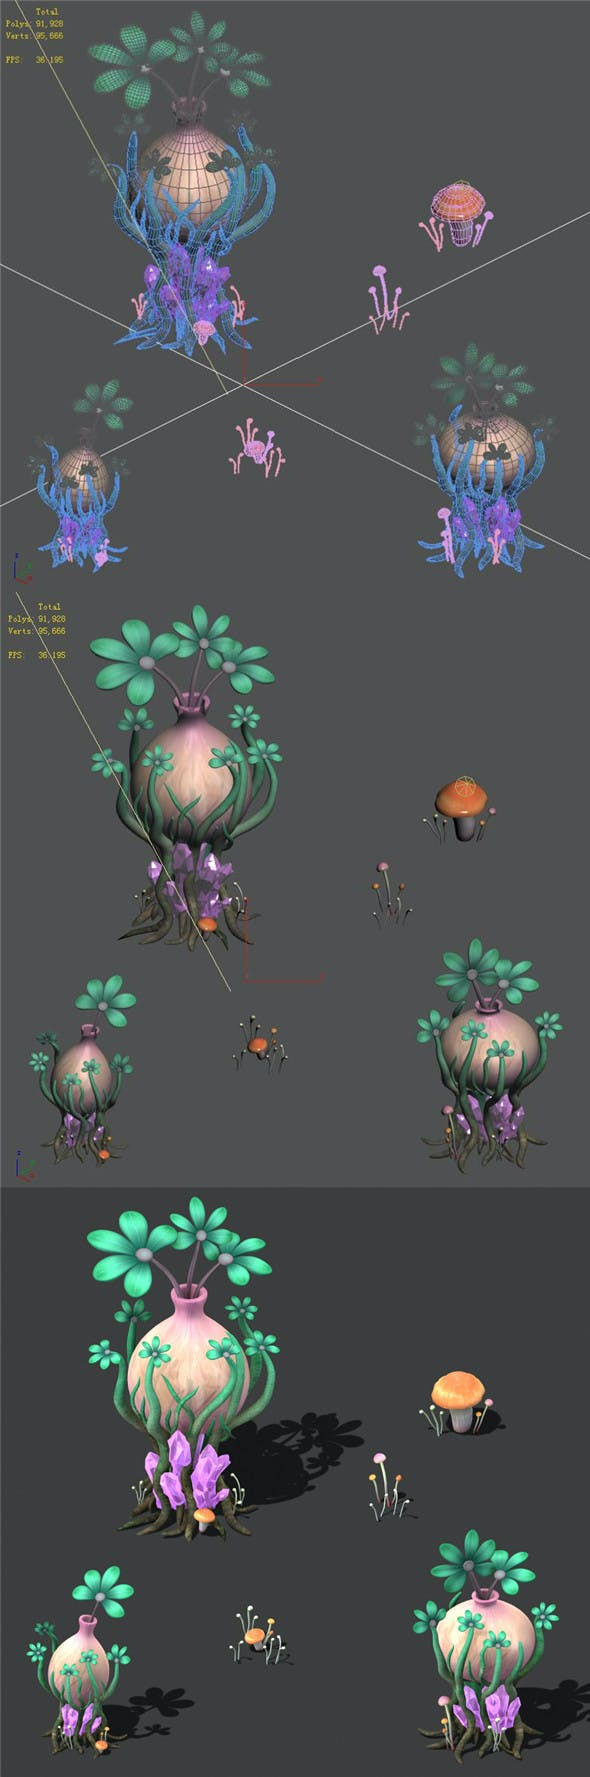 Cartoon Sky City - Water Bottle Grass - 3DOcean Item for Sale